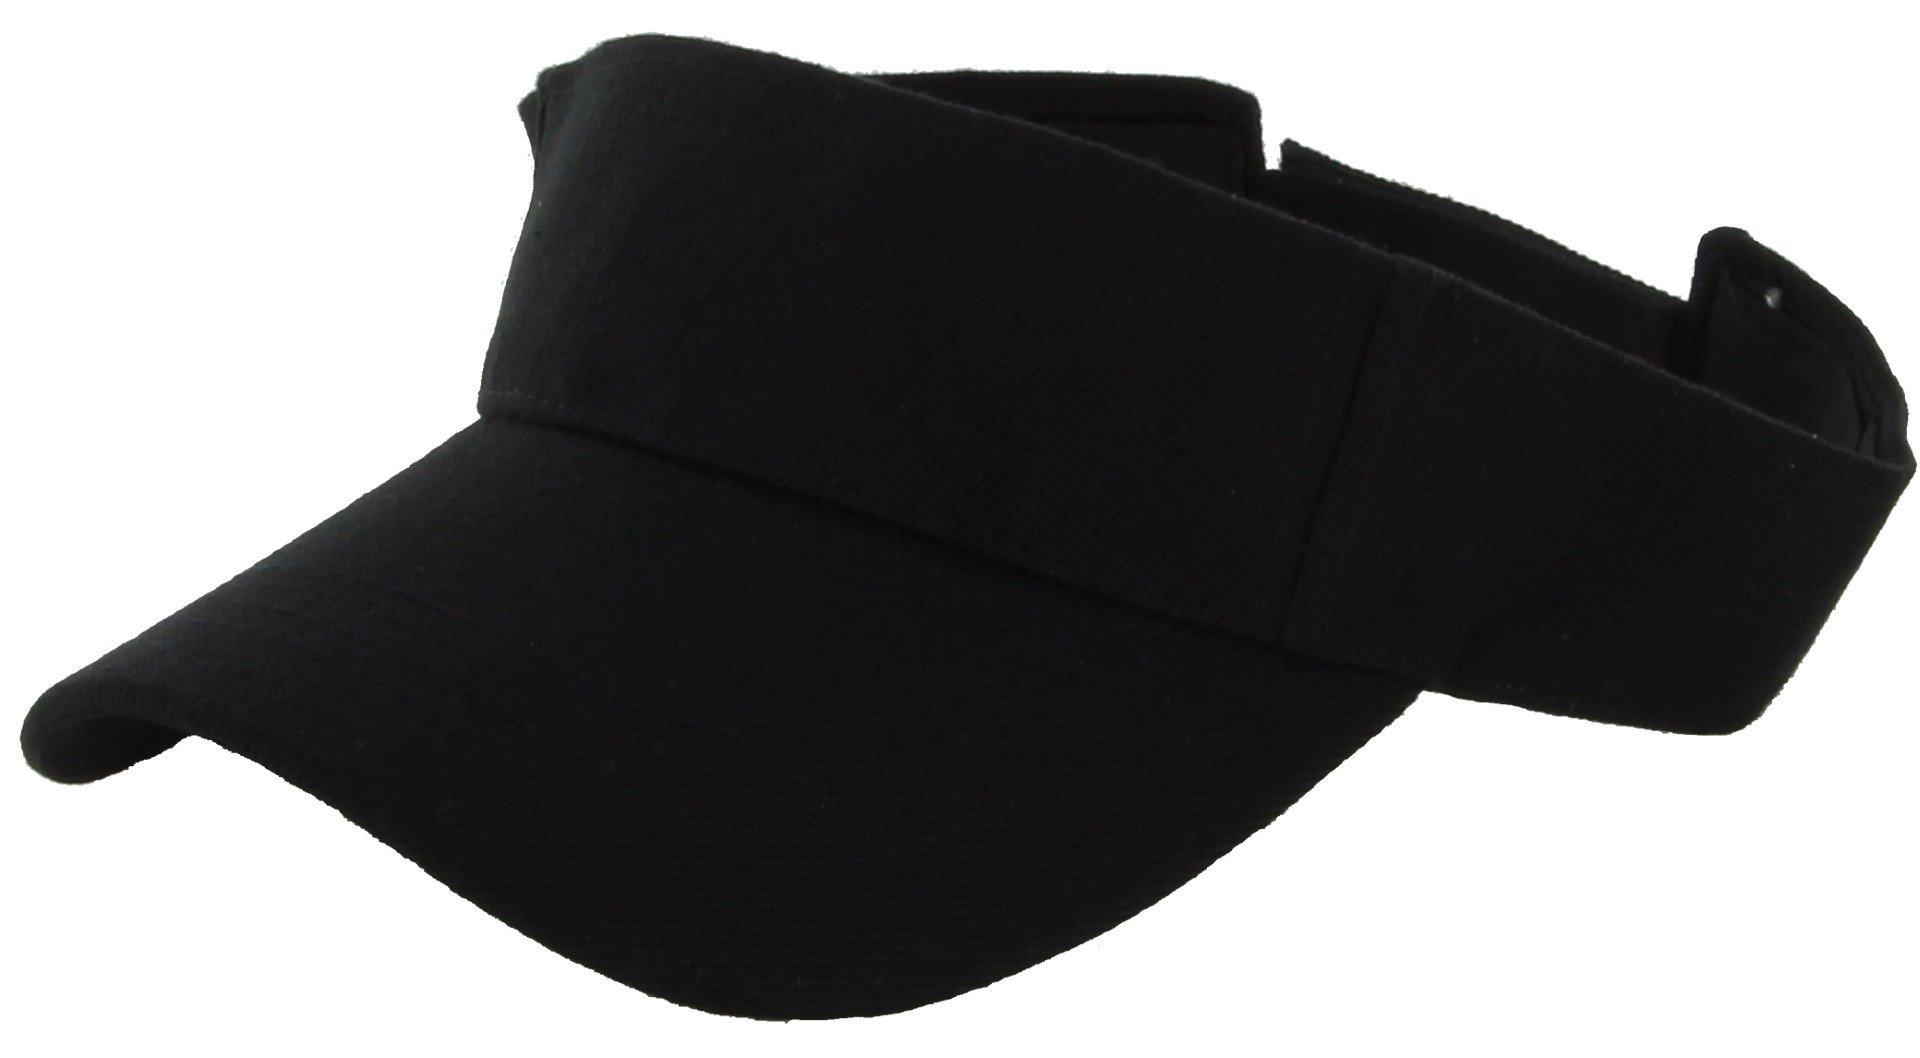 DealStock Plain Men Women Sport Sun Visor One Size Adjustable Cap (29+ Colors)